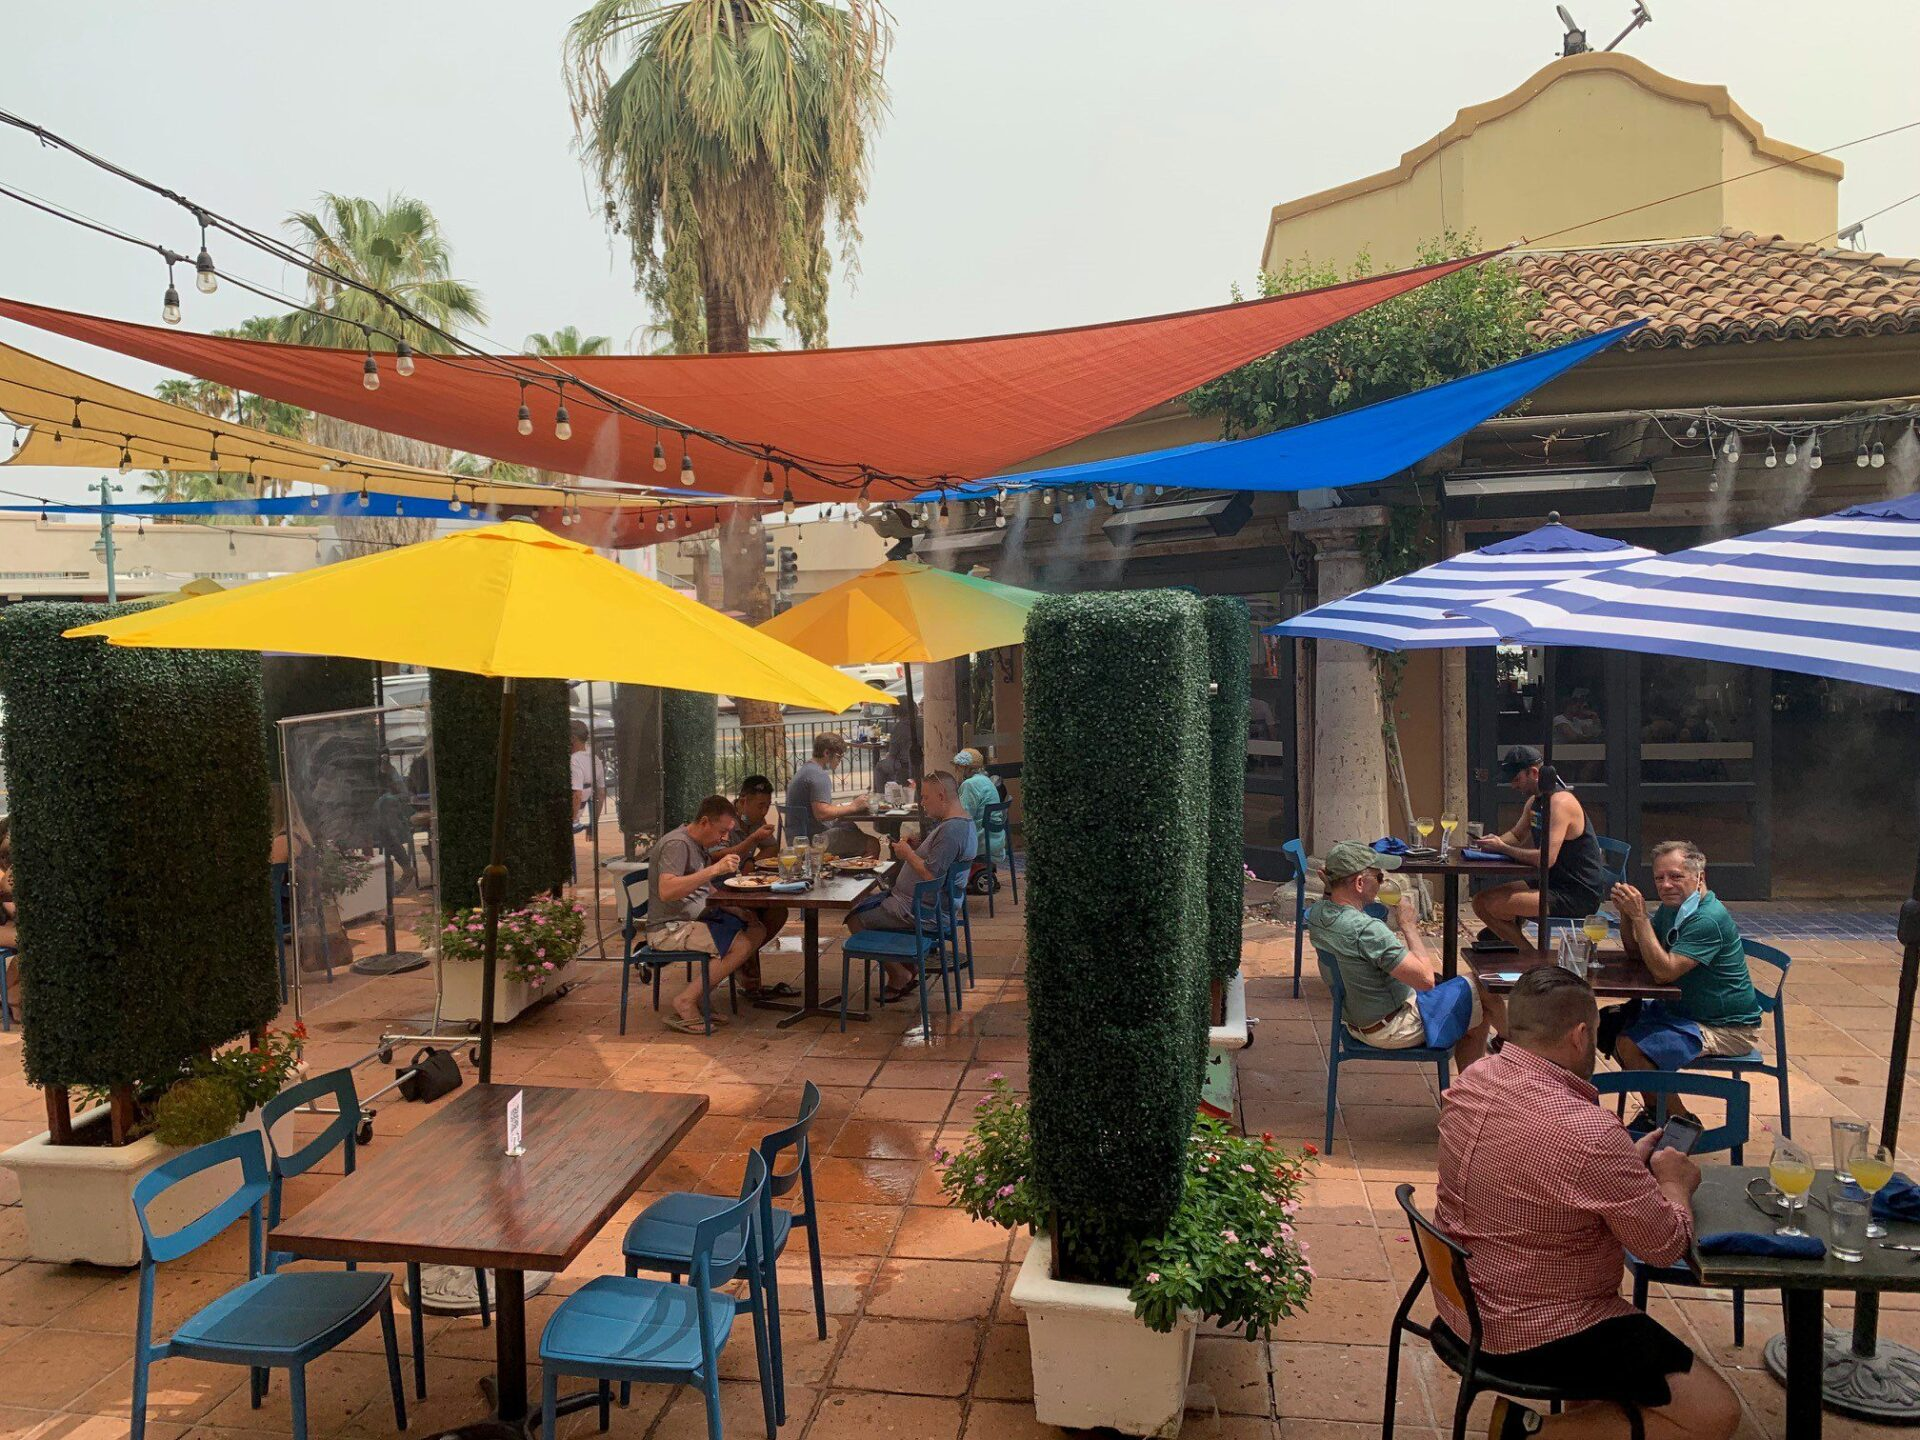 oscar's palm springs patio